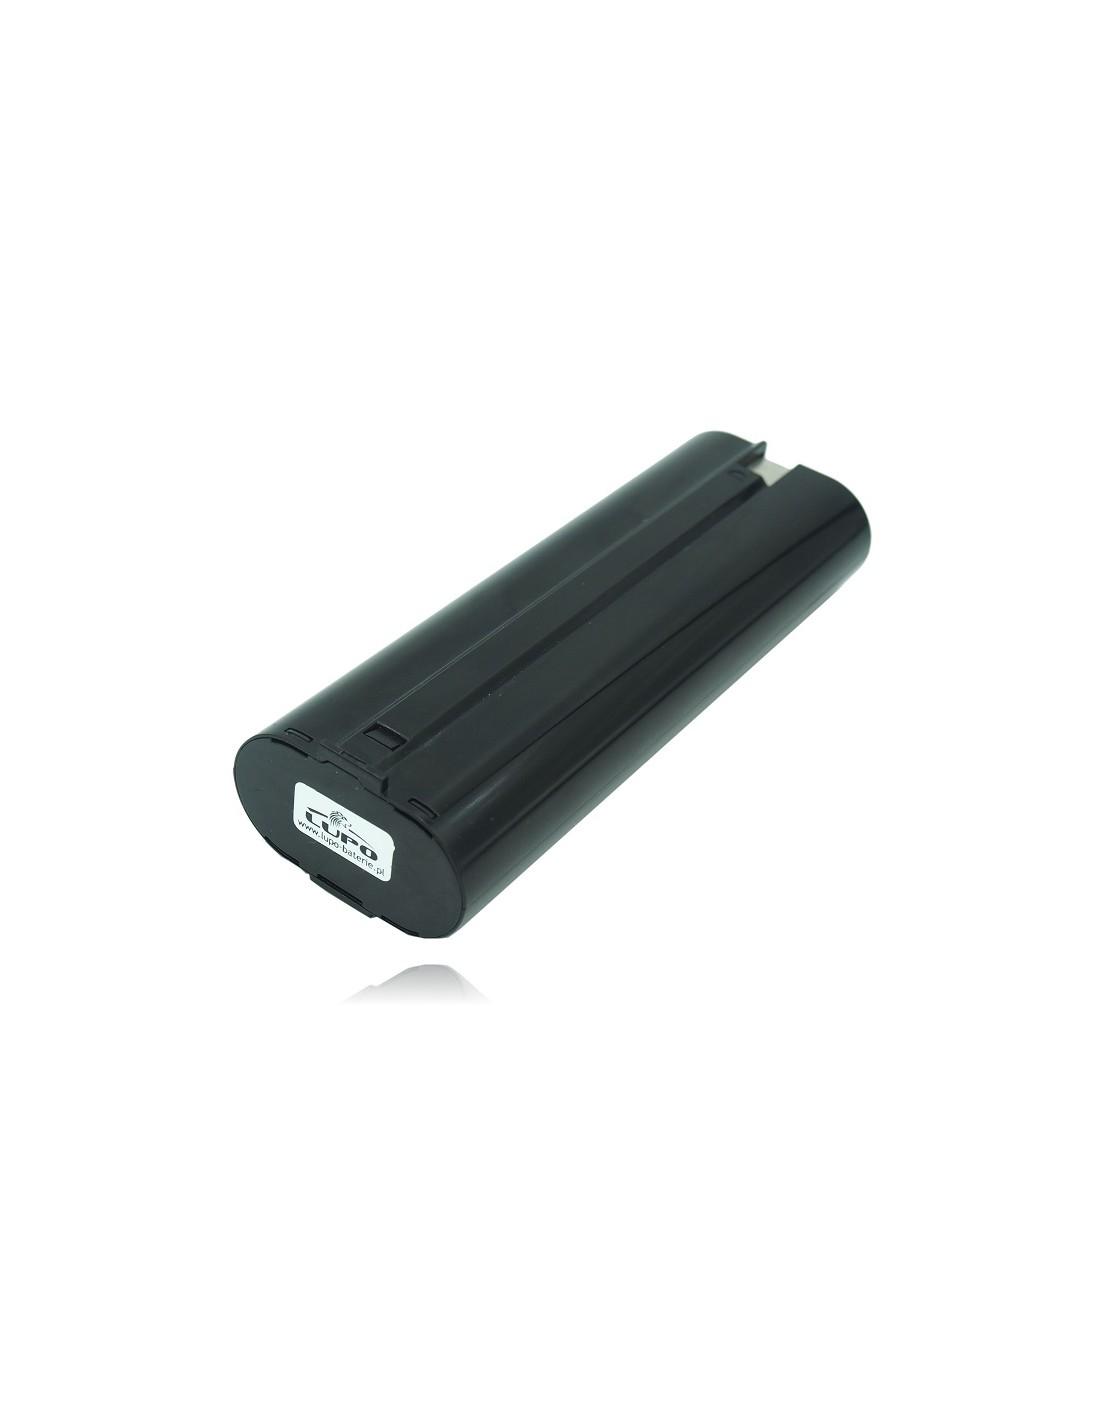 Ryobi BD1020 BD1020CR HBD72TR comme ABS10 B-72A vhbw Batterie 3300mAh AEG A10 ABSE10 P7.2; Milwaukee P7.2 HBD72TR BD1020CD AL7 B72A BD102CR